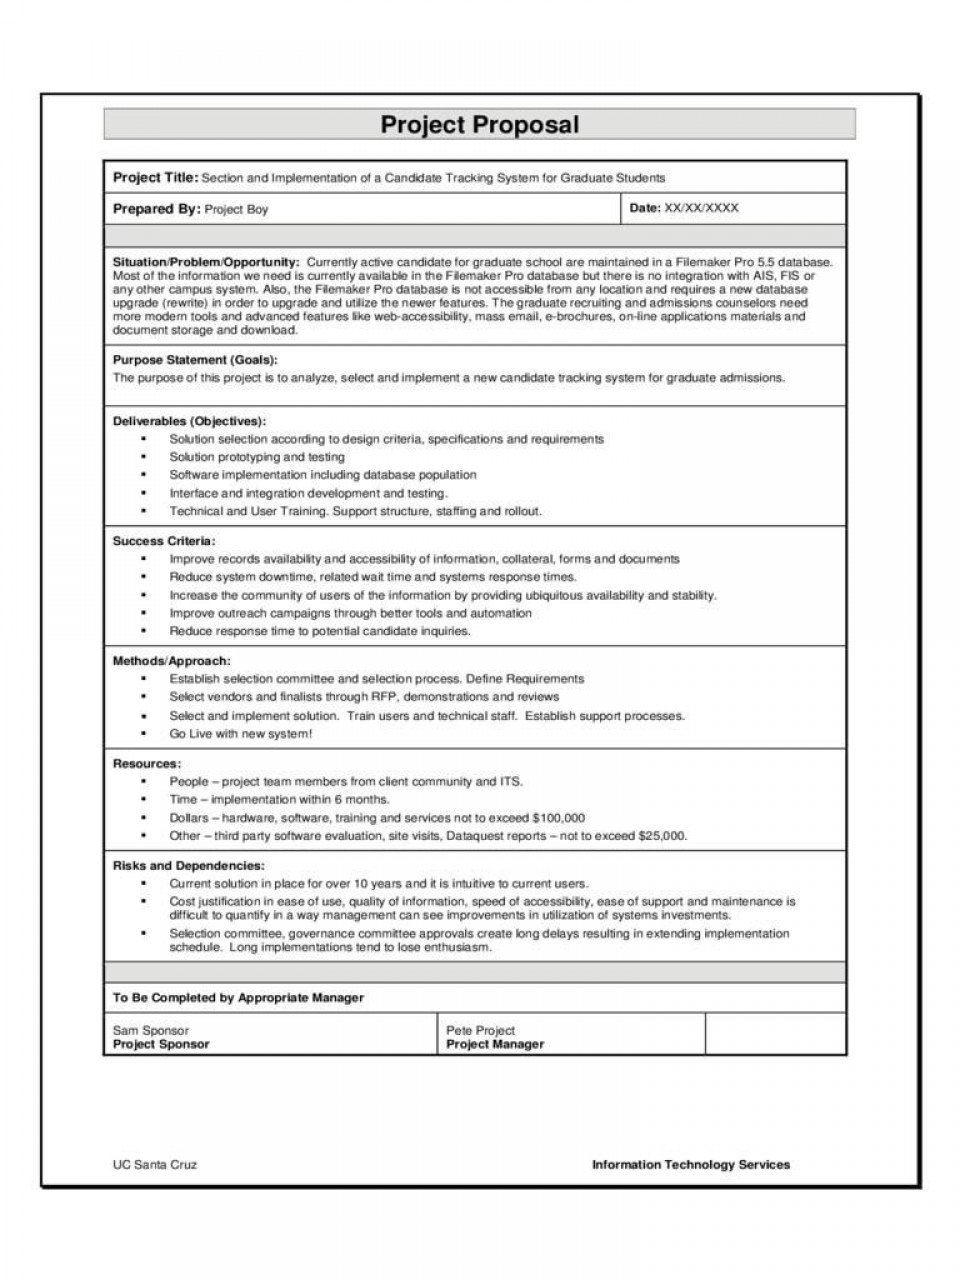 003 Impressive Software Project Management Plan Example Pdf Inspiration  Risk Template960